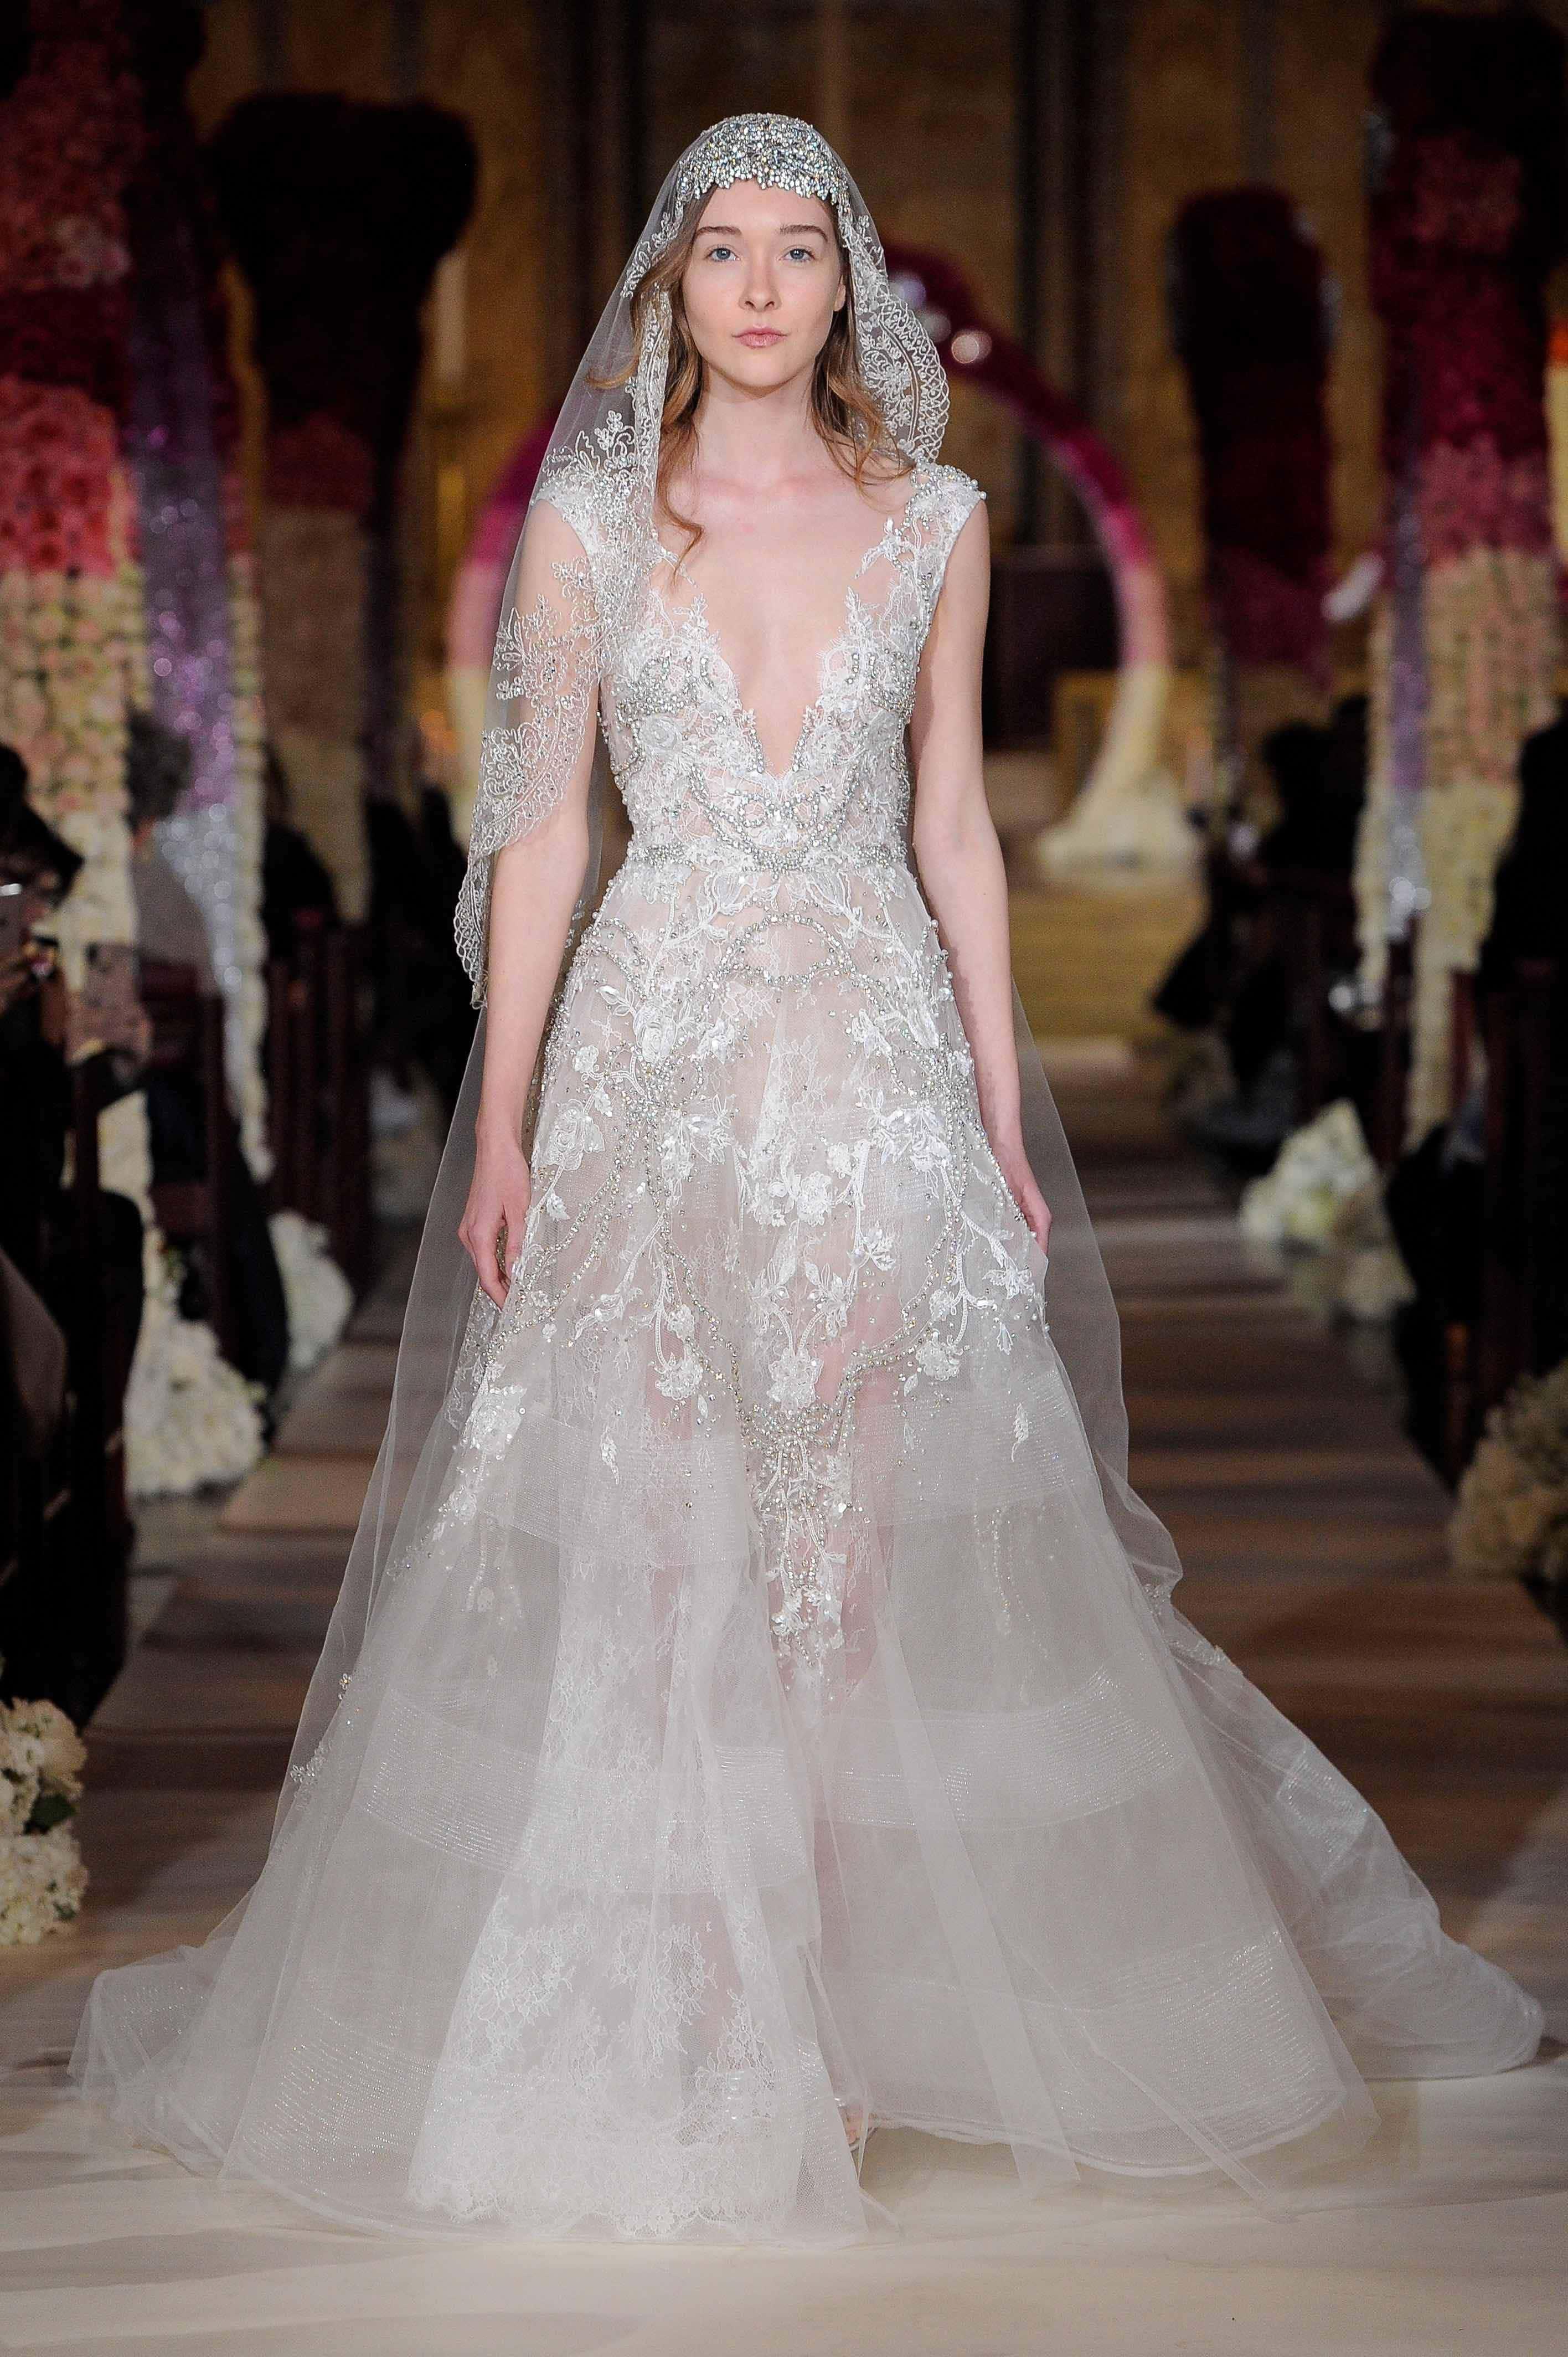 Wedding dress collection: Reem Acra – Thankyou